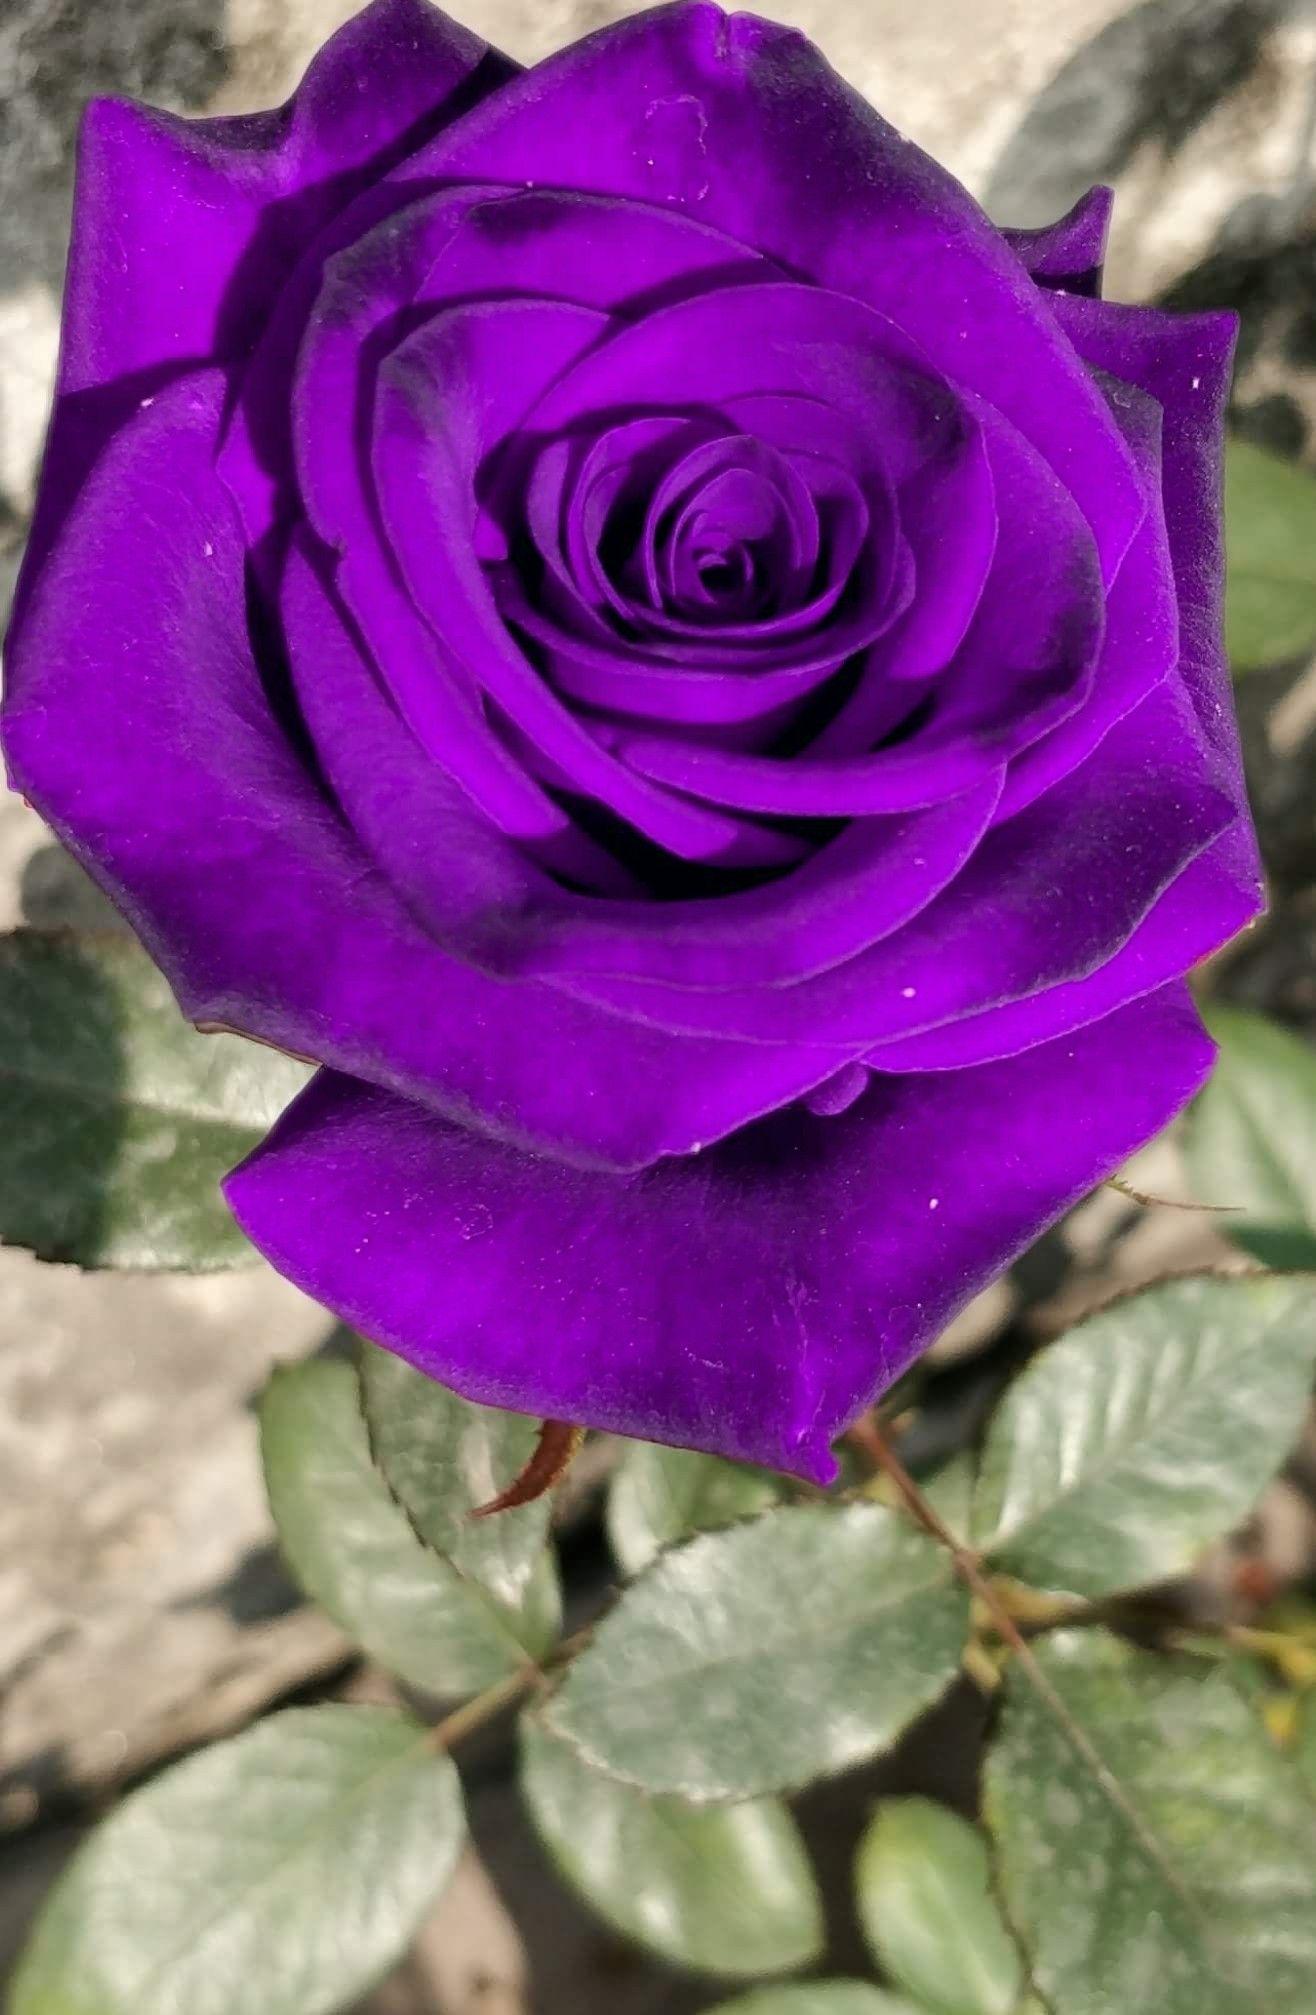 Bonita Rosa Rosas Púrpuras Rosas Y Flores